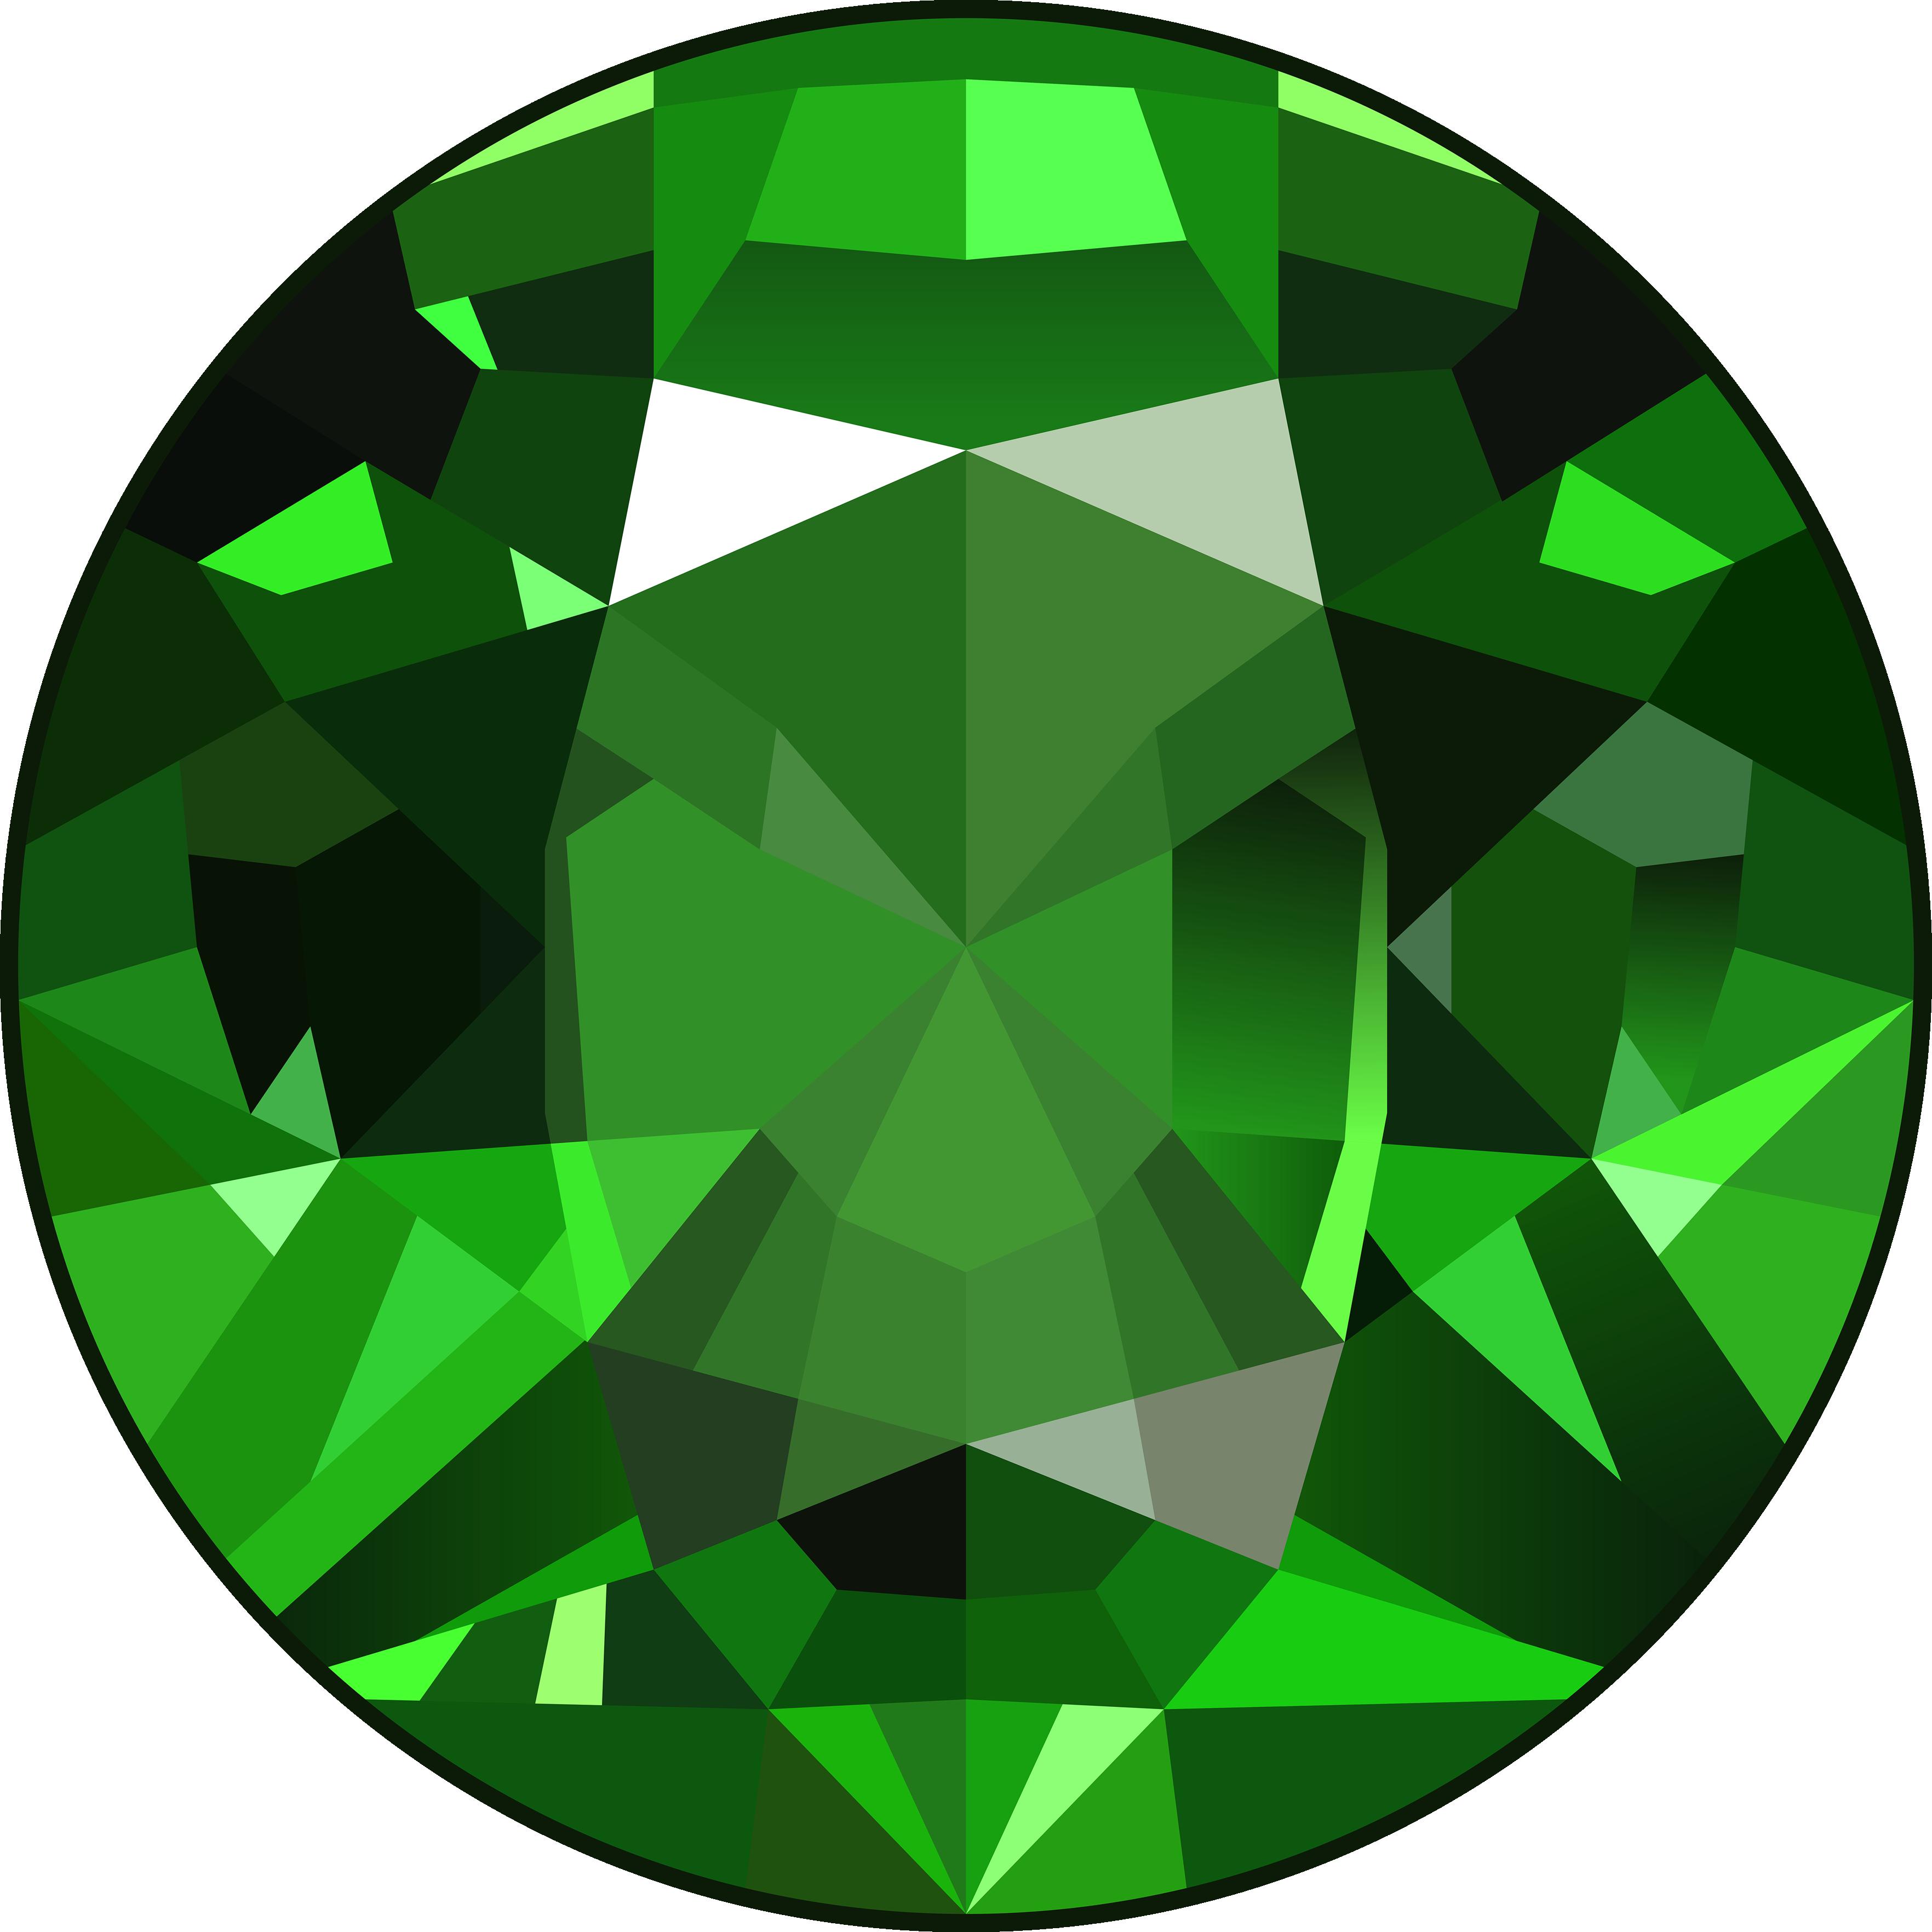 Gem clipart gemstone. Download emerald stone free